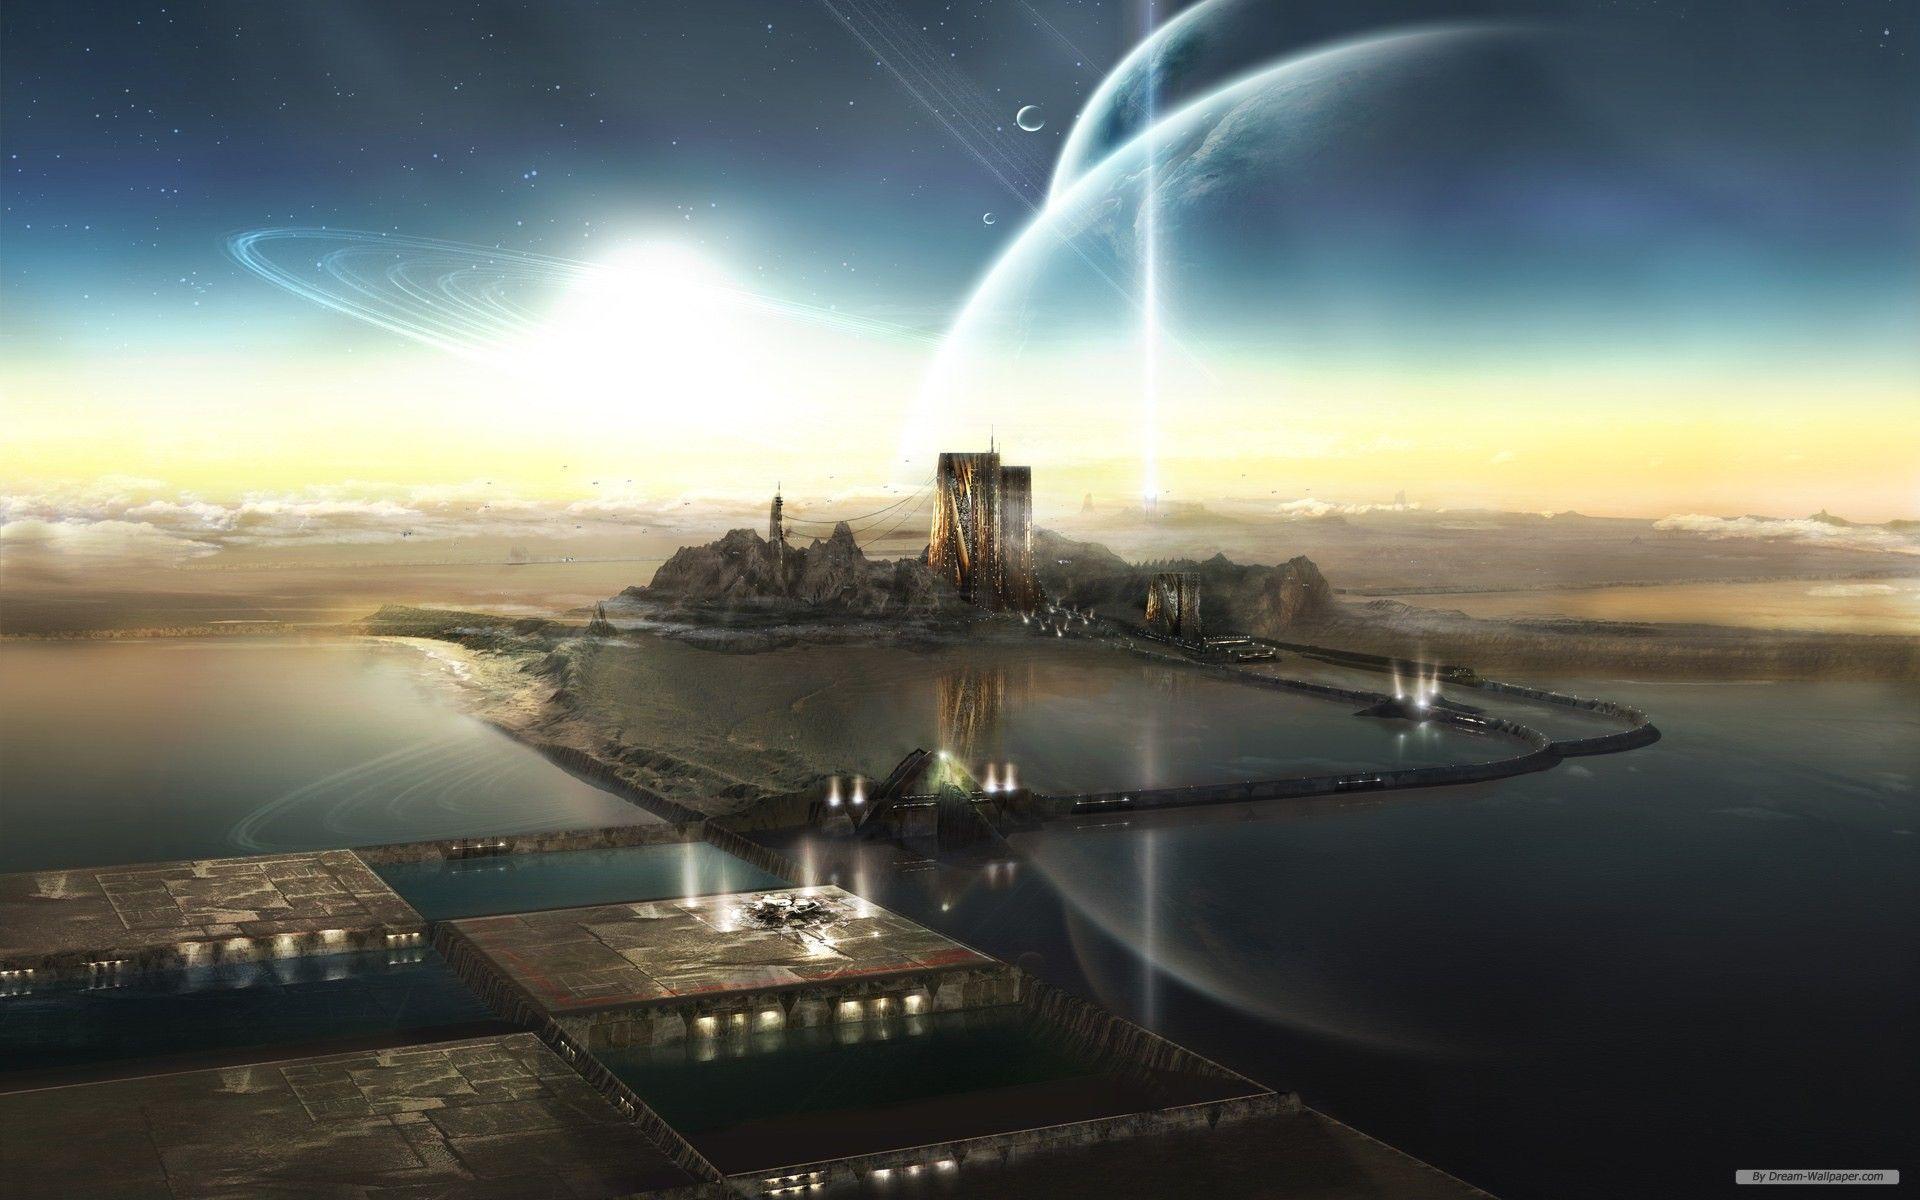 Sci Fi Wallpaper Image By Jerry Horton Jr On Beyond Future Wallpaper City Wallpaper